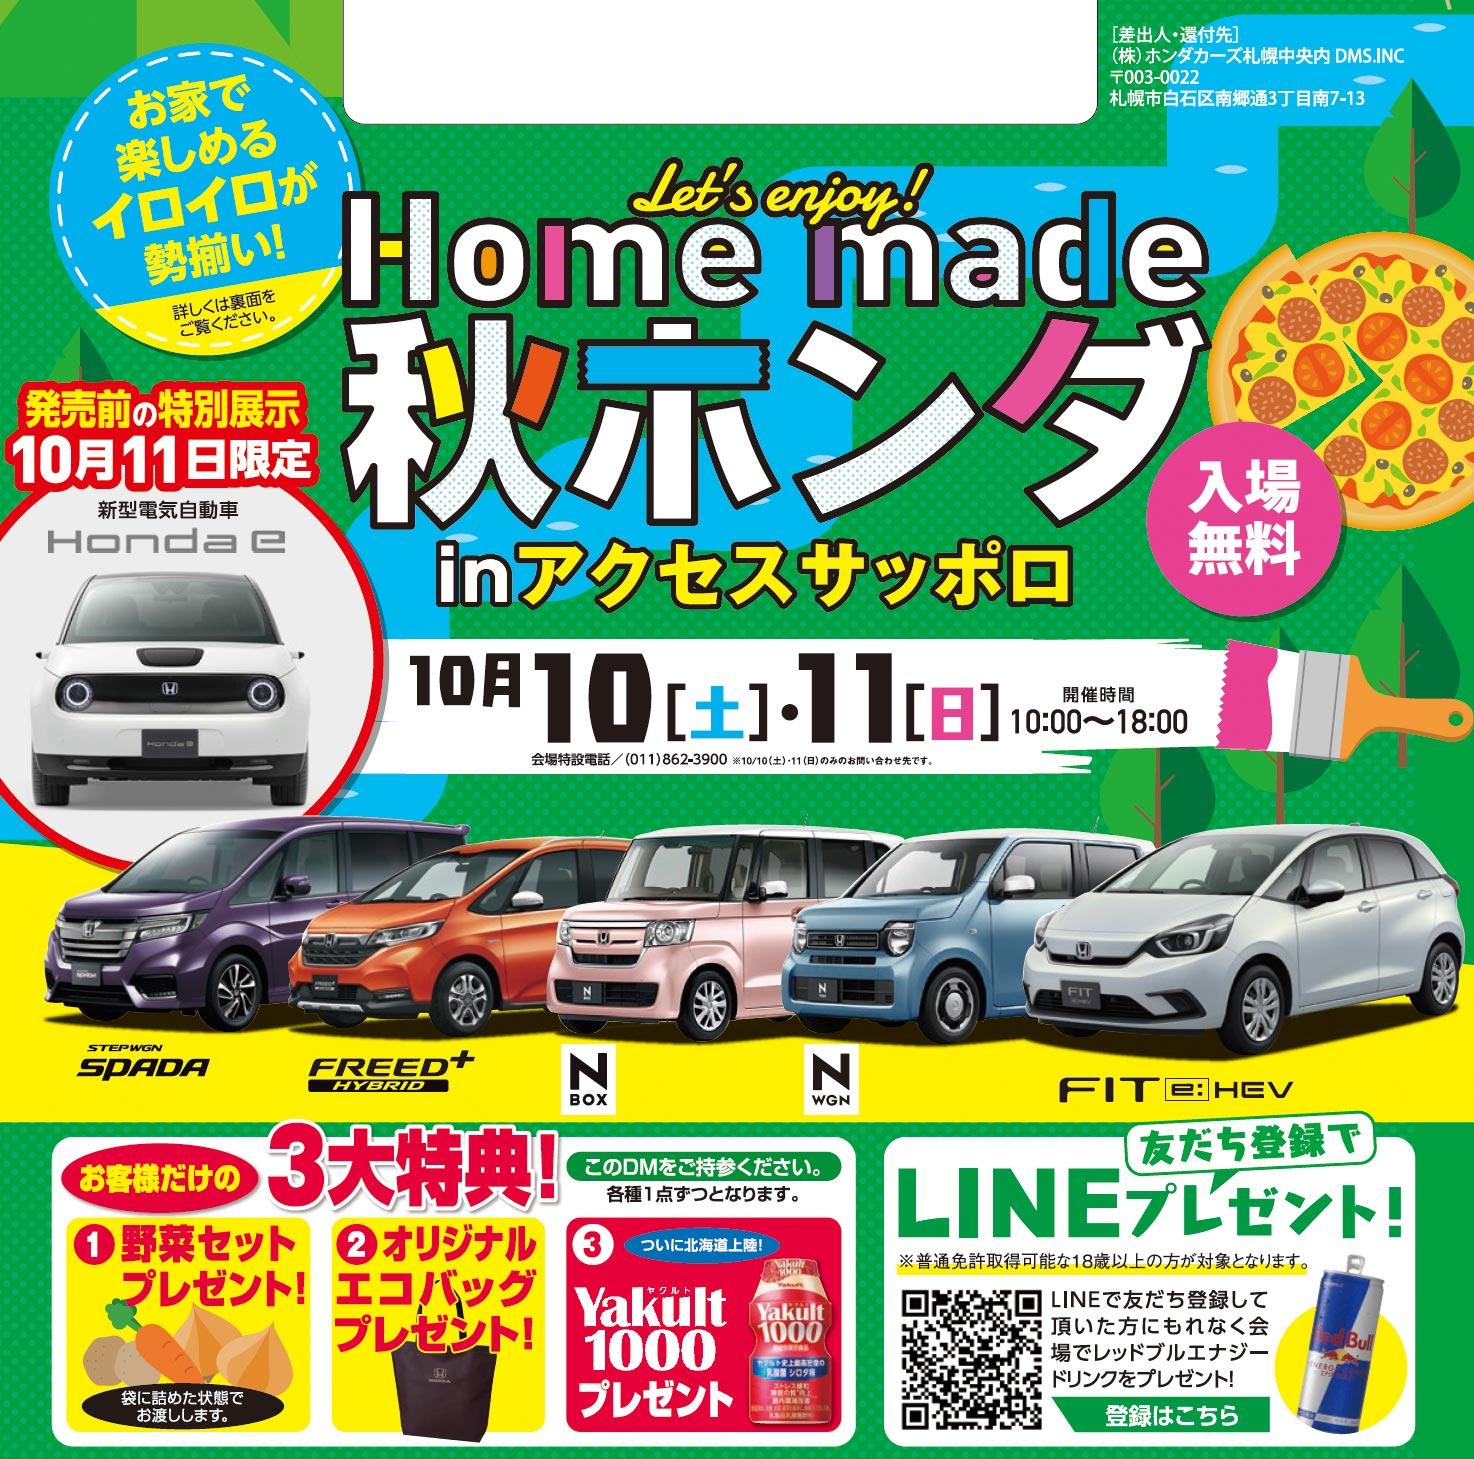 home made 秋ホンダ